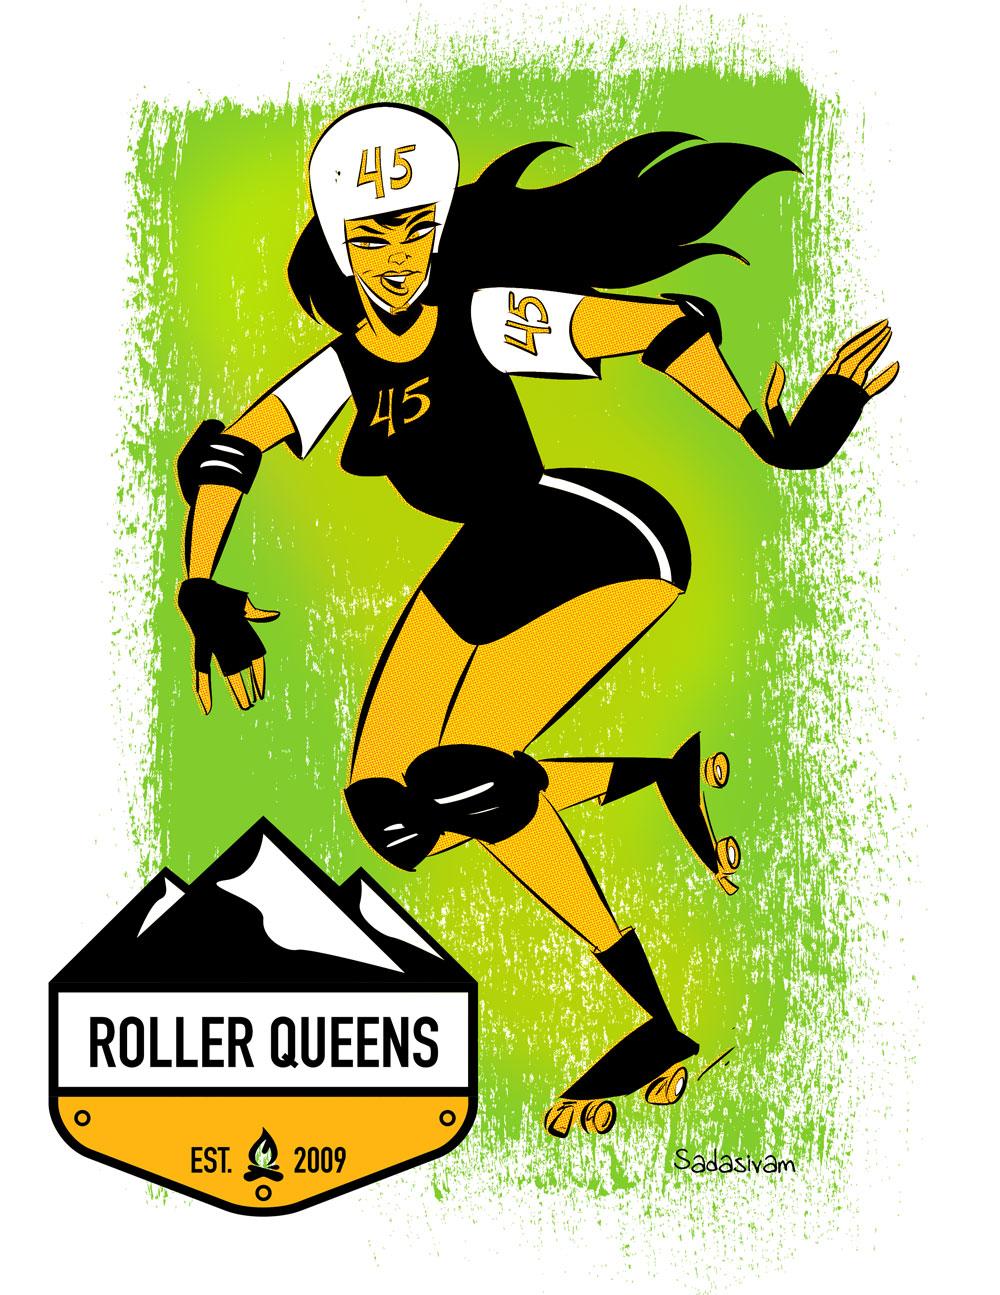 roller_derby_girl